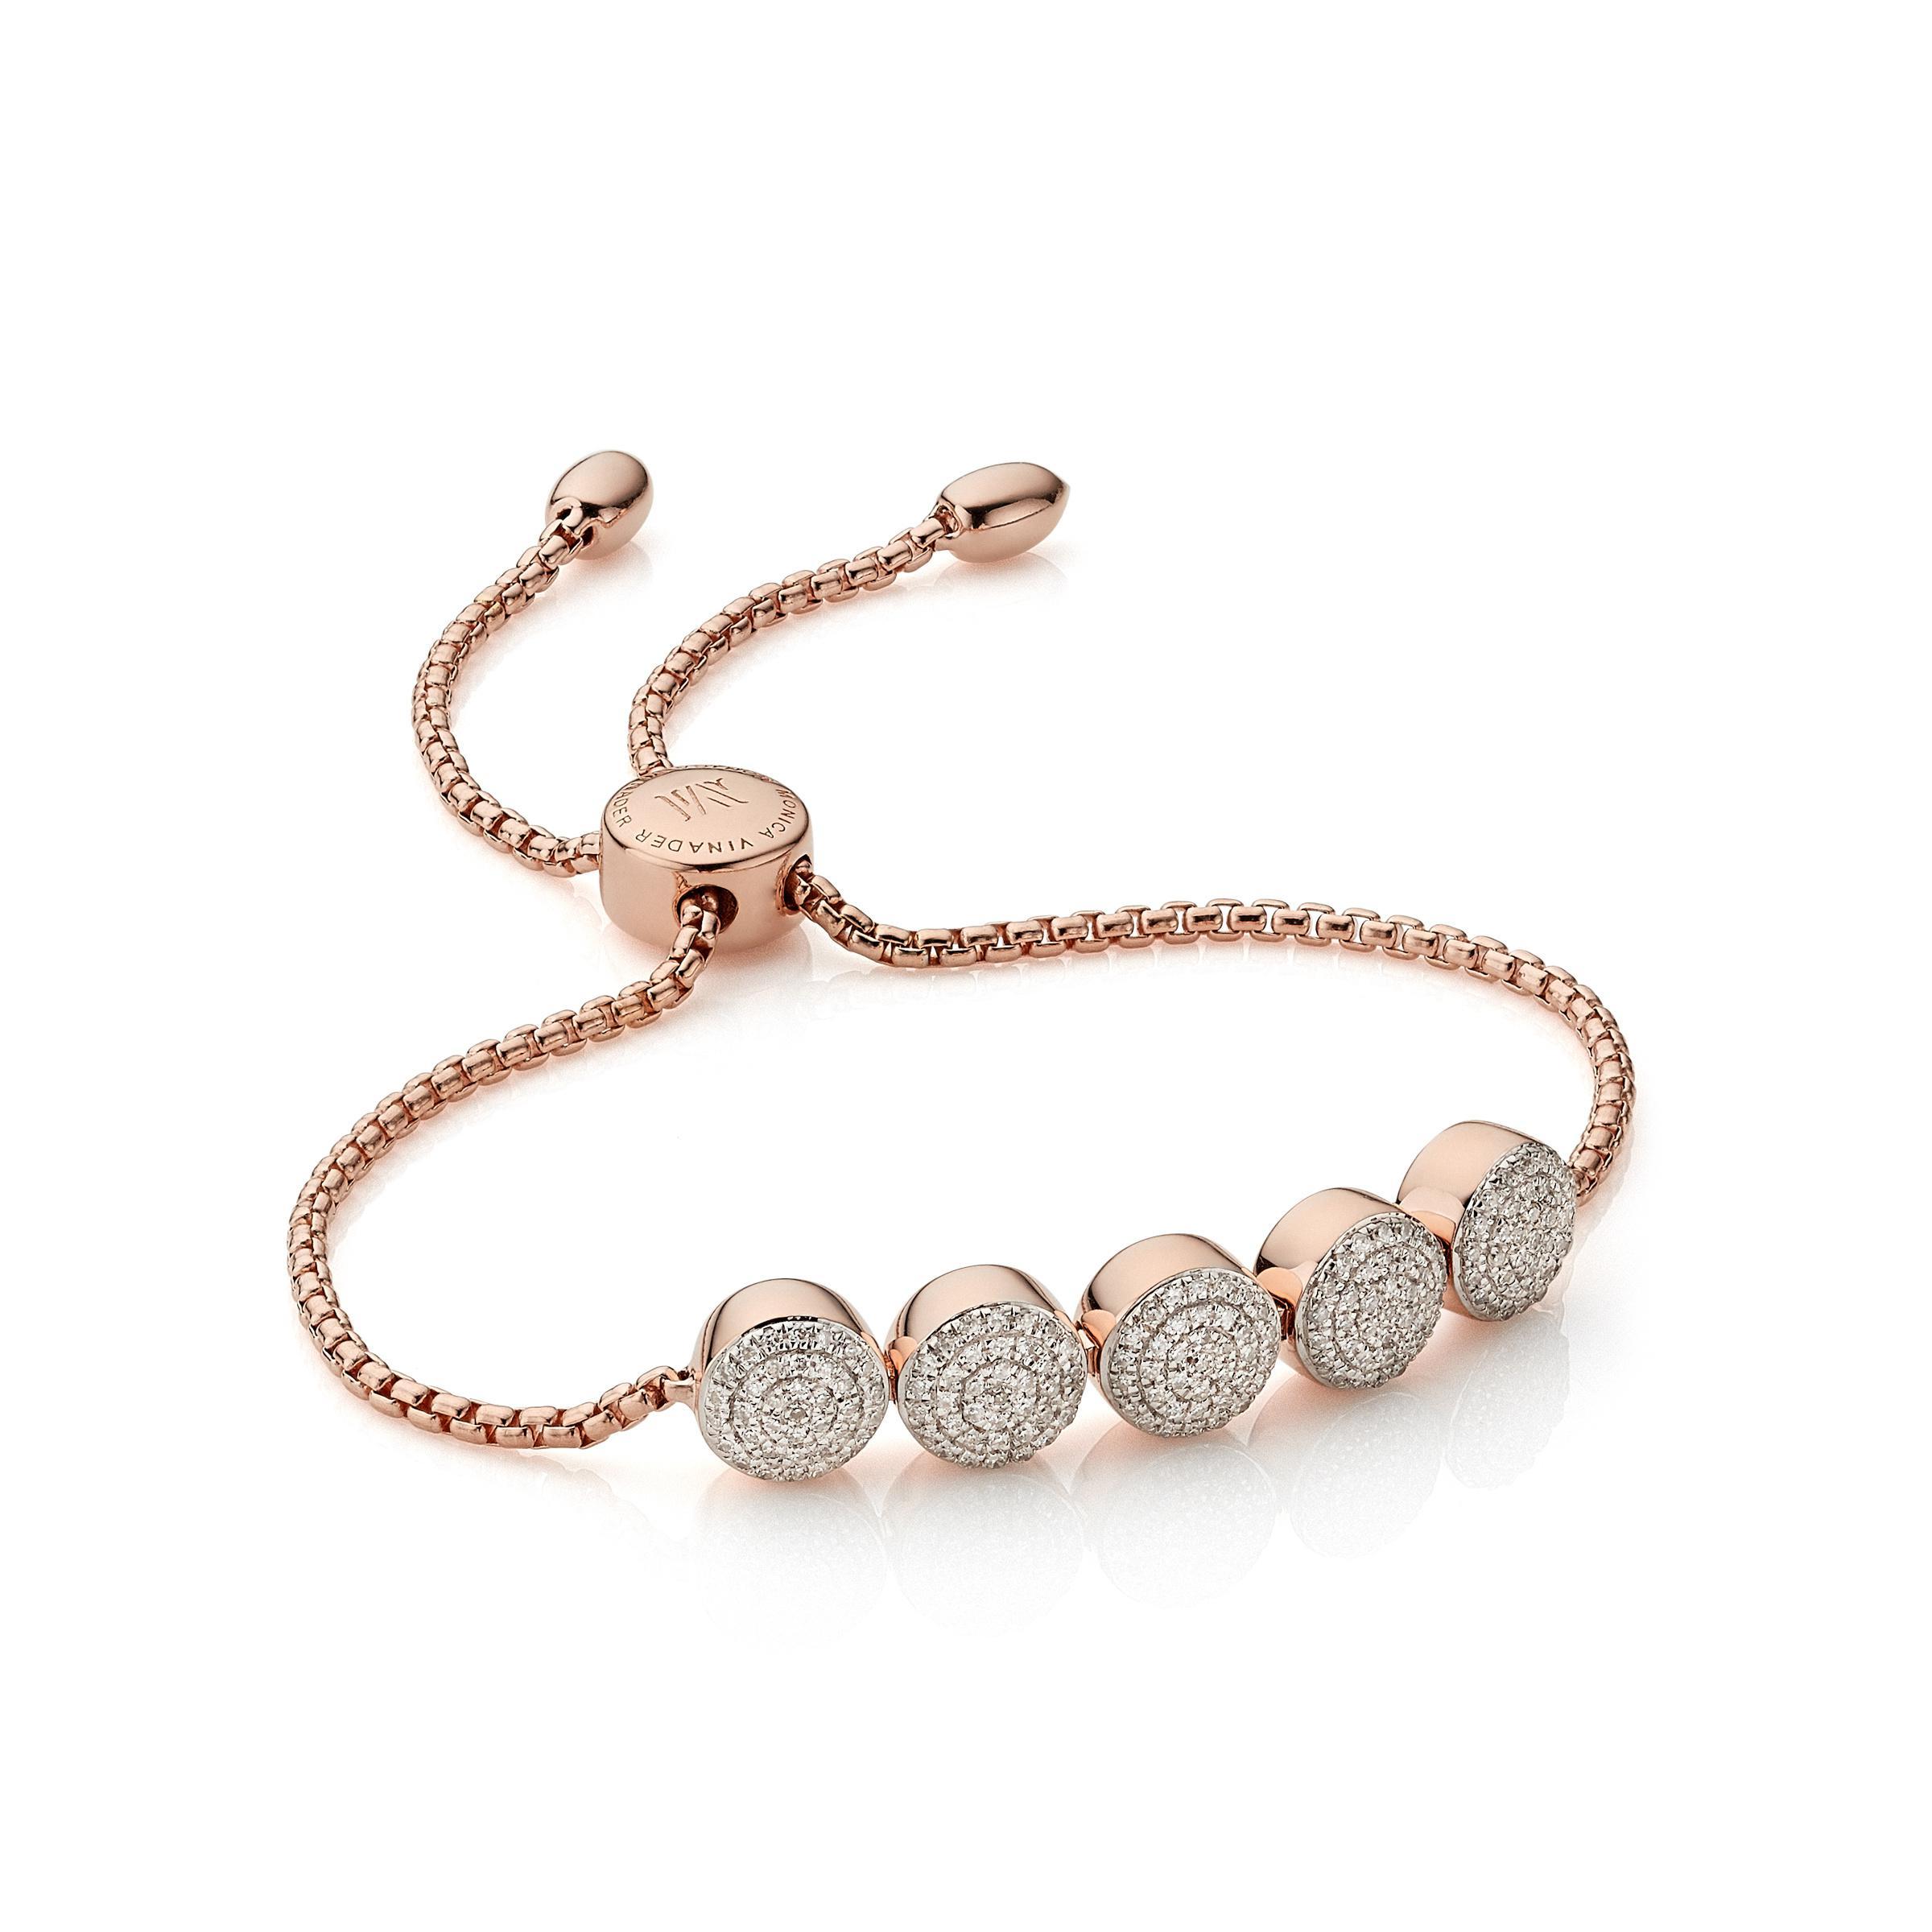 f6c631a53b748 Women's Fiji Button Friendship Chain Bracelet